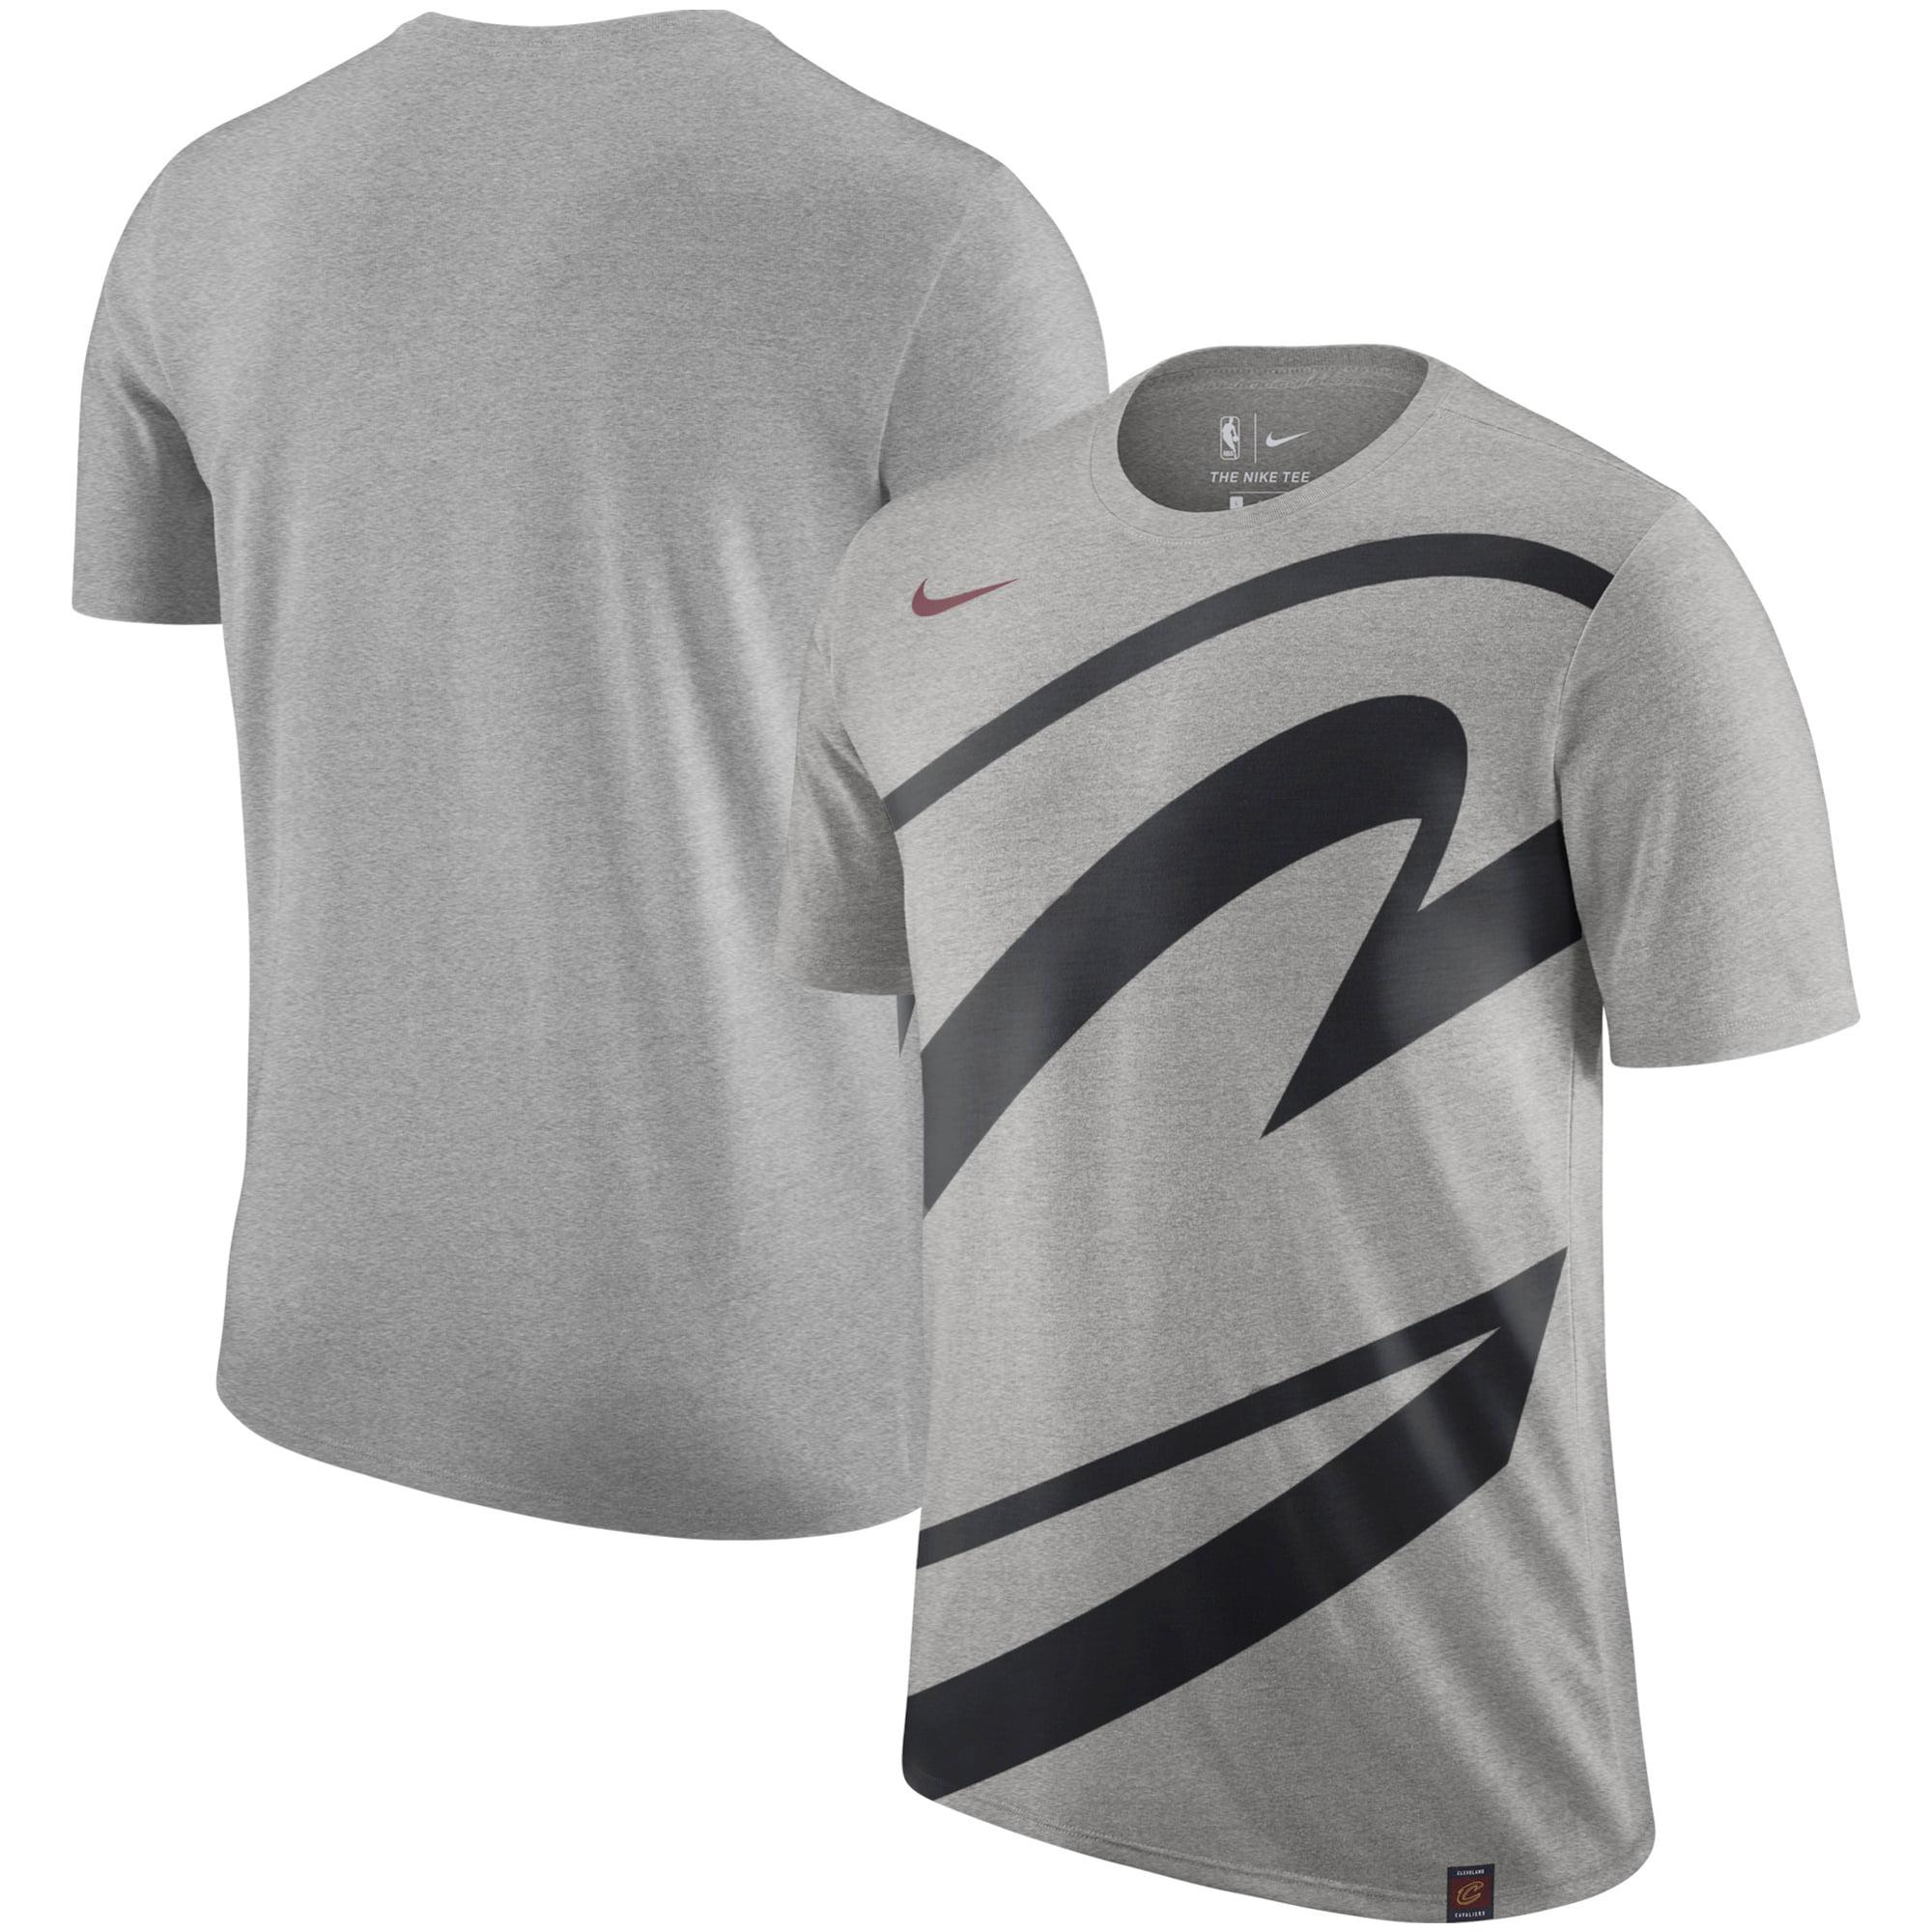 wholesale dealer ff88b 6d149 Cleveland Cavaliers Nike Oversize Logo Performance Tri-Blend T-Shirt - Gray